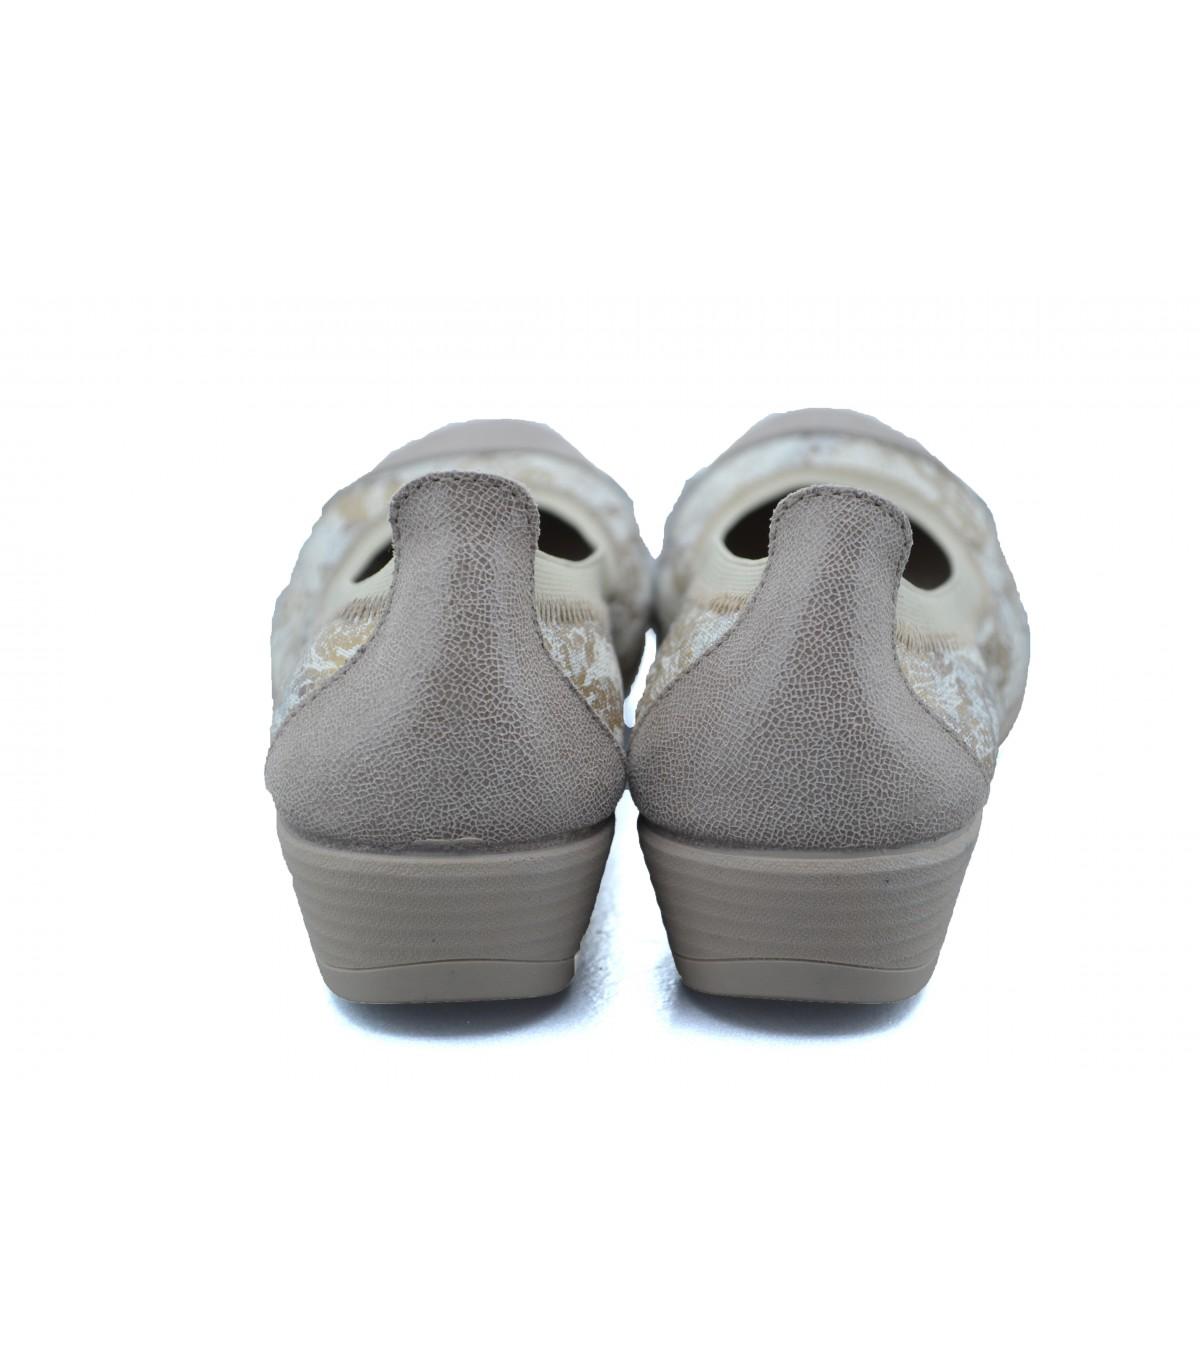 60a70cbb Bailarinas mujer VULLADI Boa   Zapatos Online   Calzado Mujer